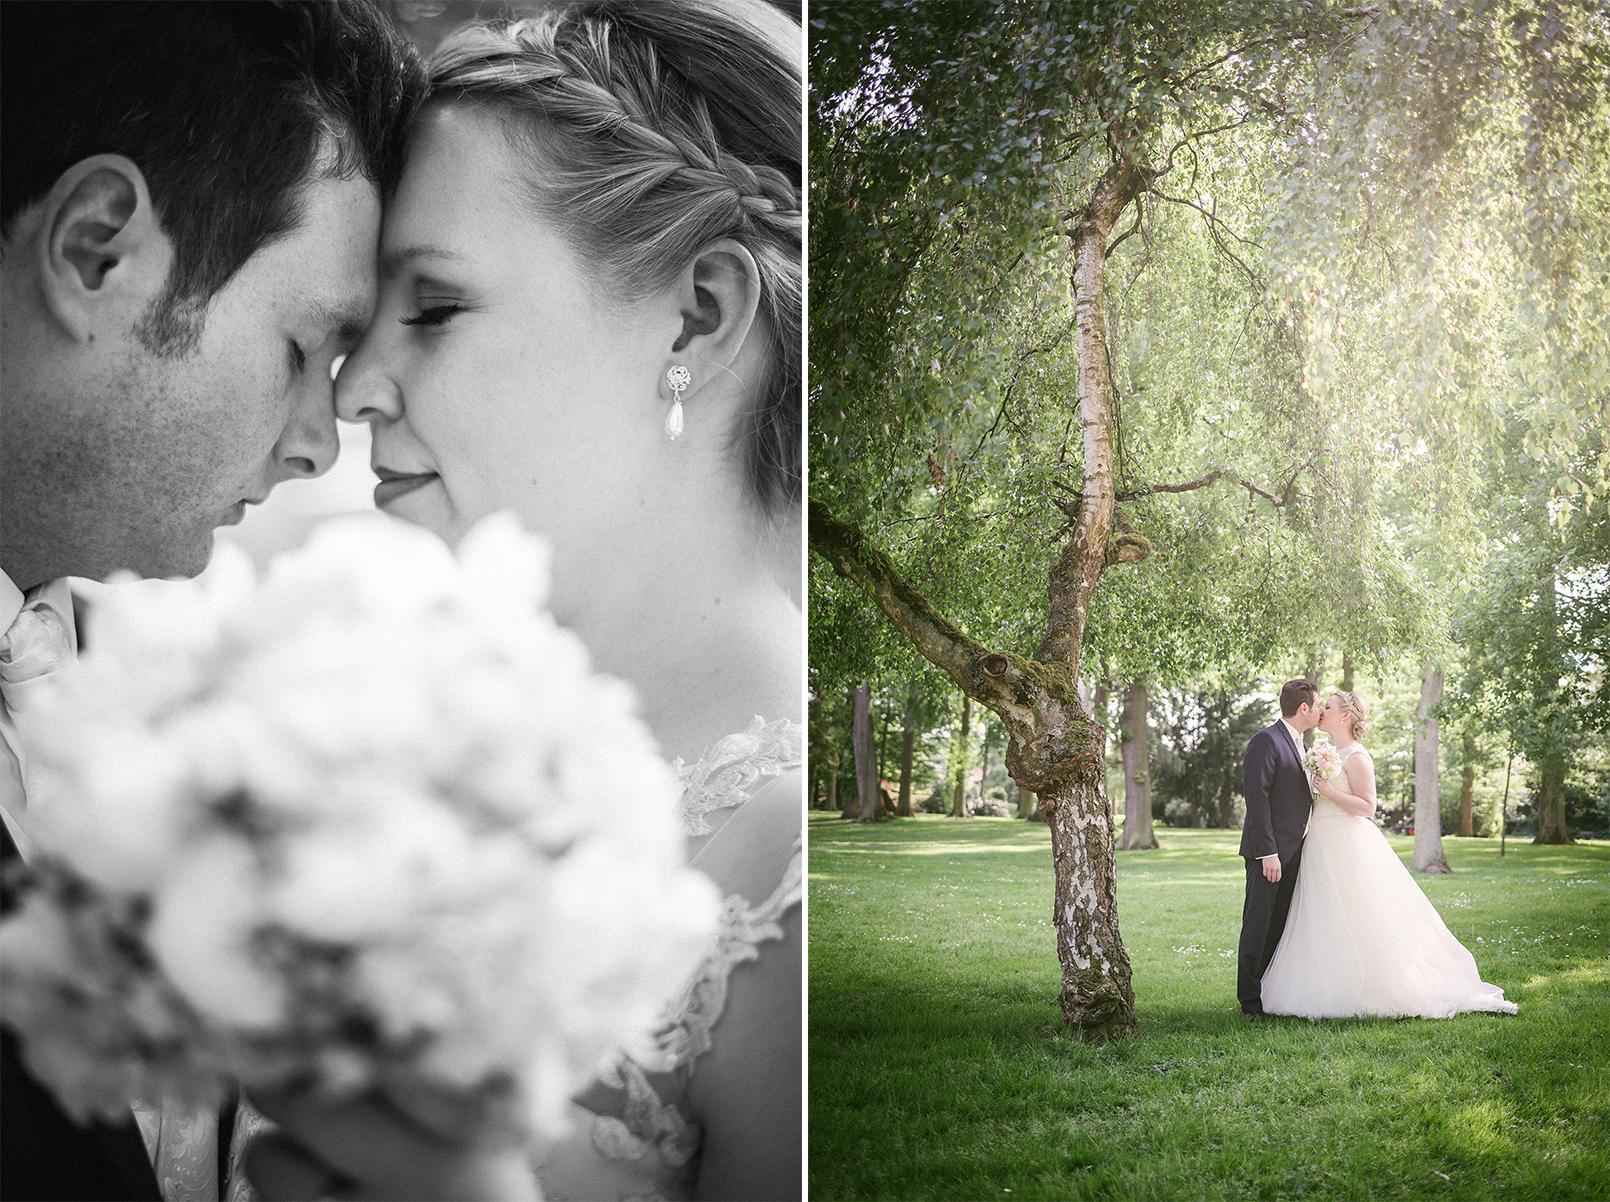 Hochzeitsfotografie-Heinsberg-Aachen-Wegberg-Dreamcatcher-Fotograf-0001 (28)